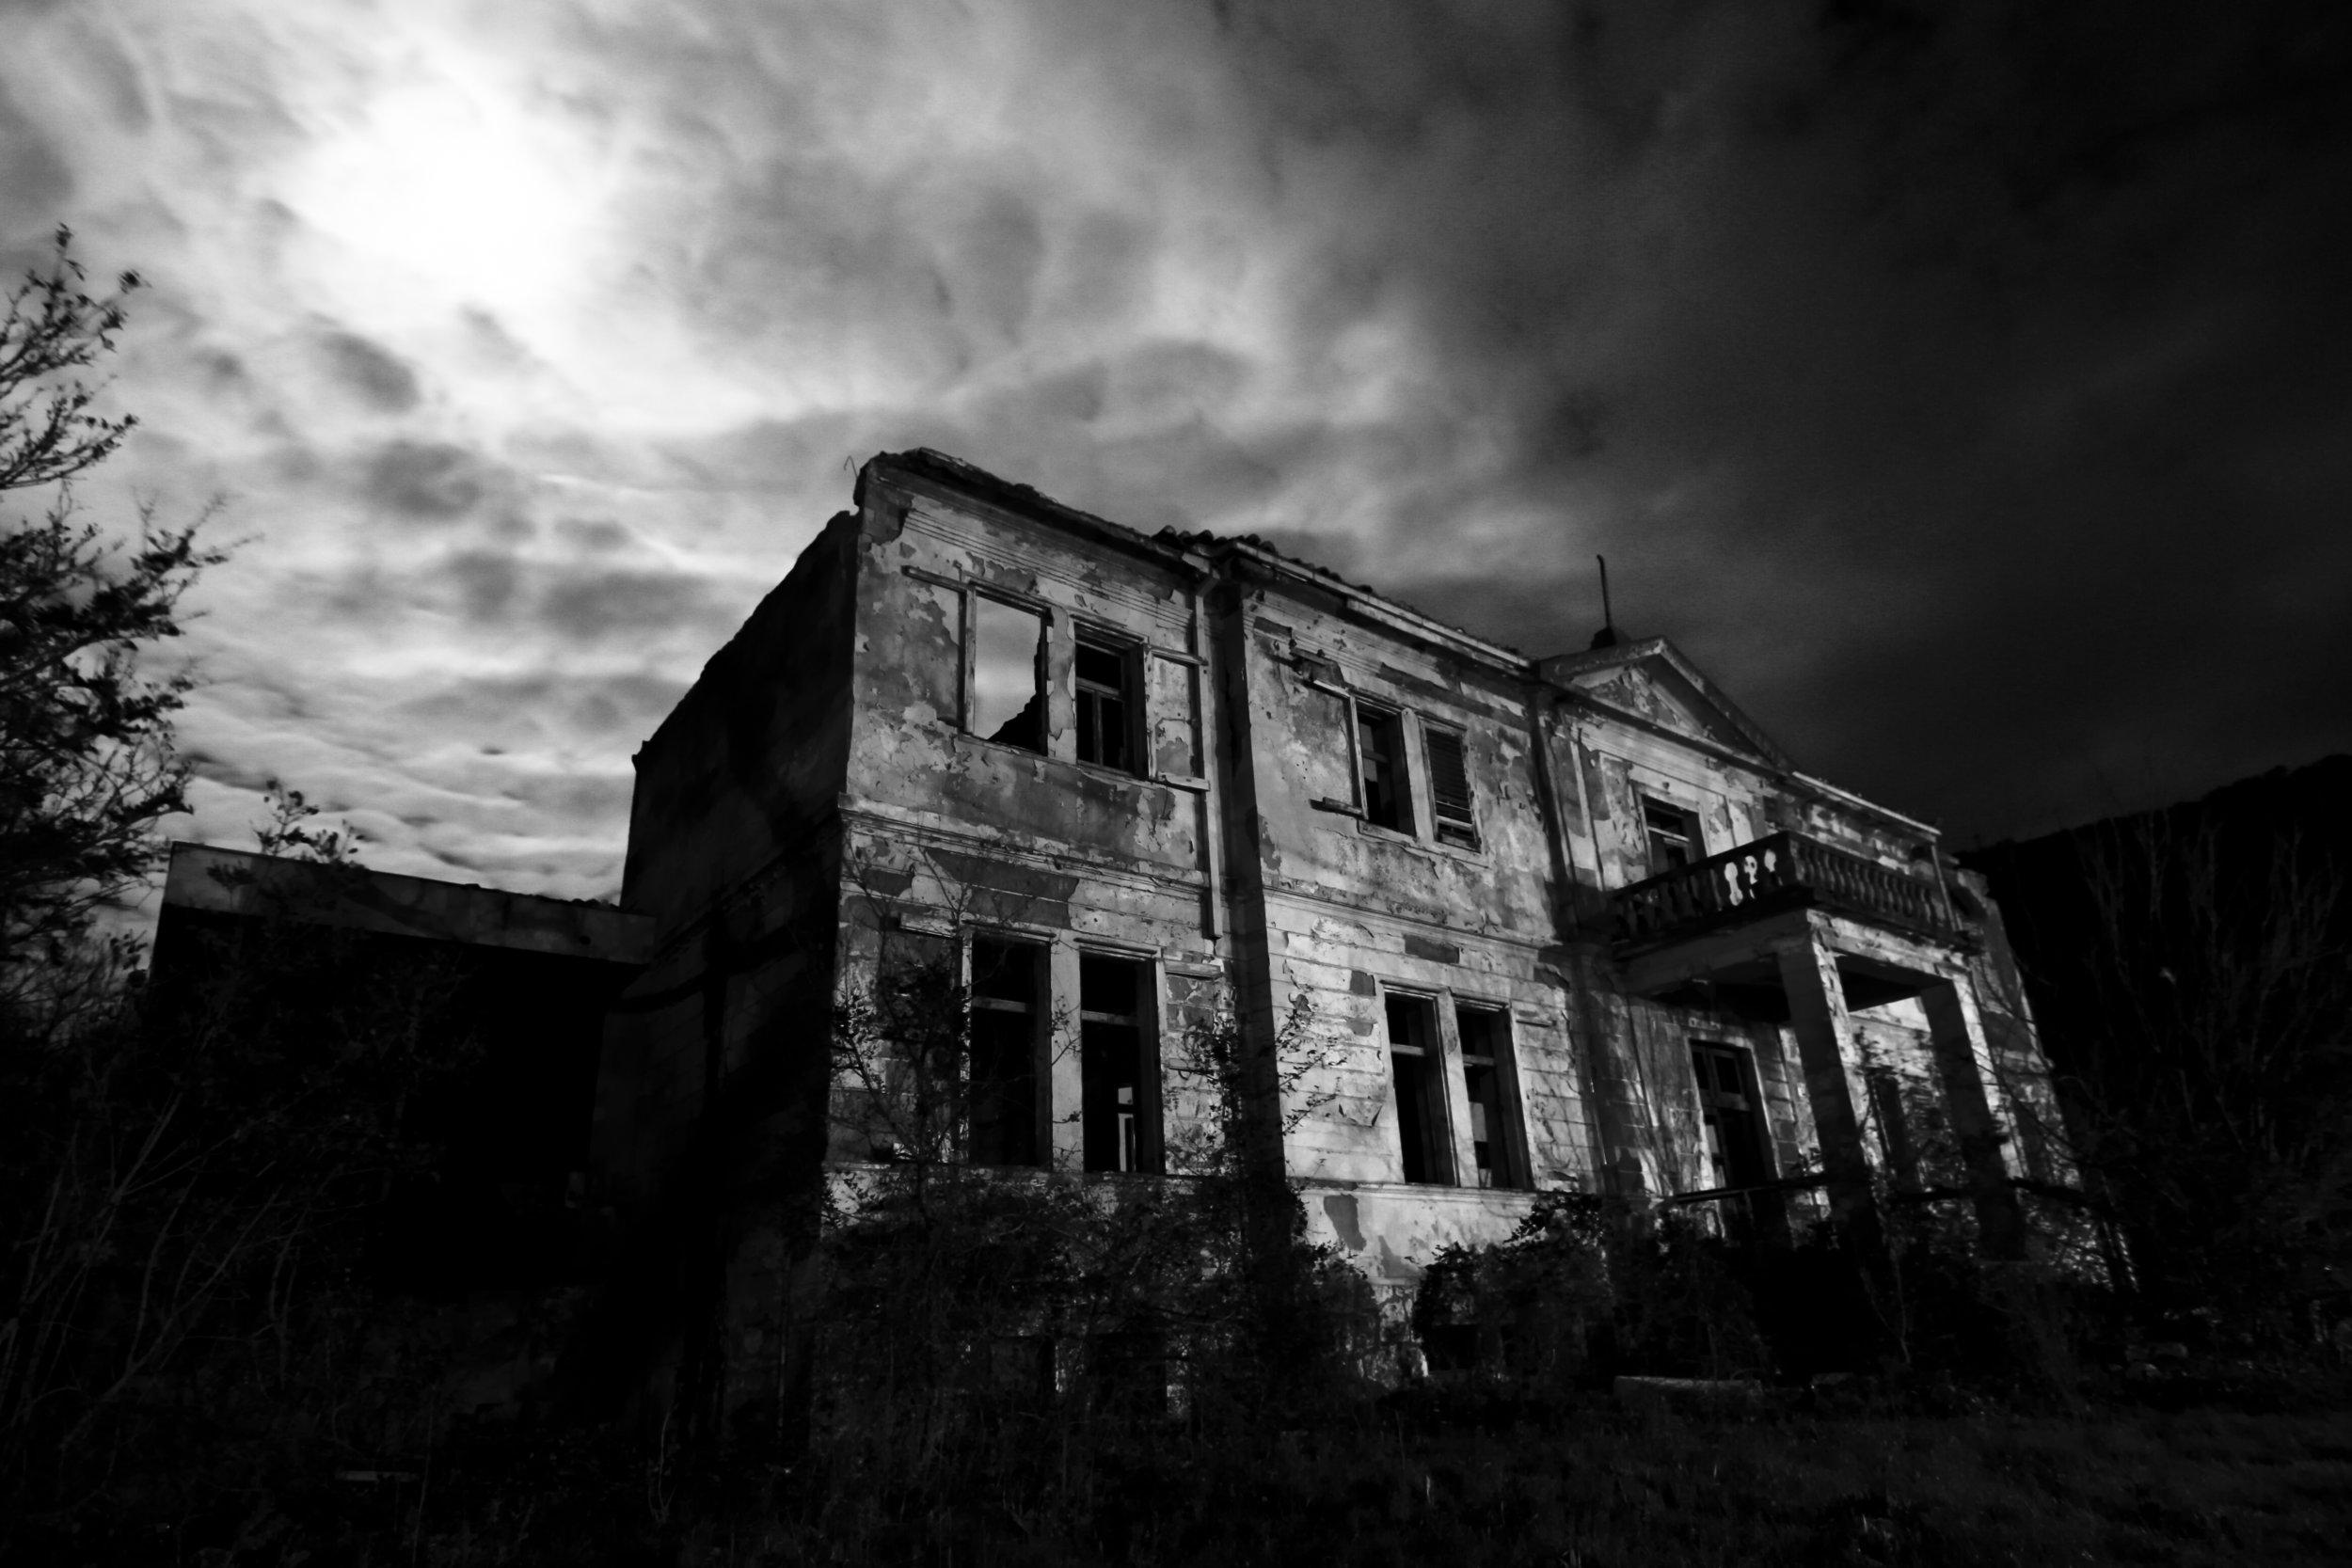 - Underhill Manor